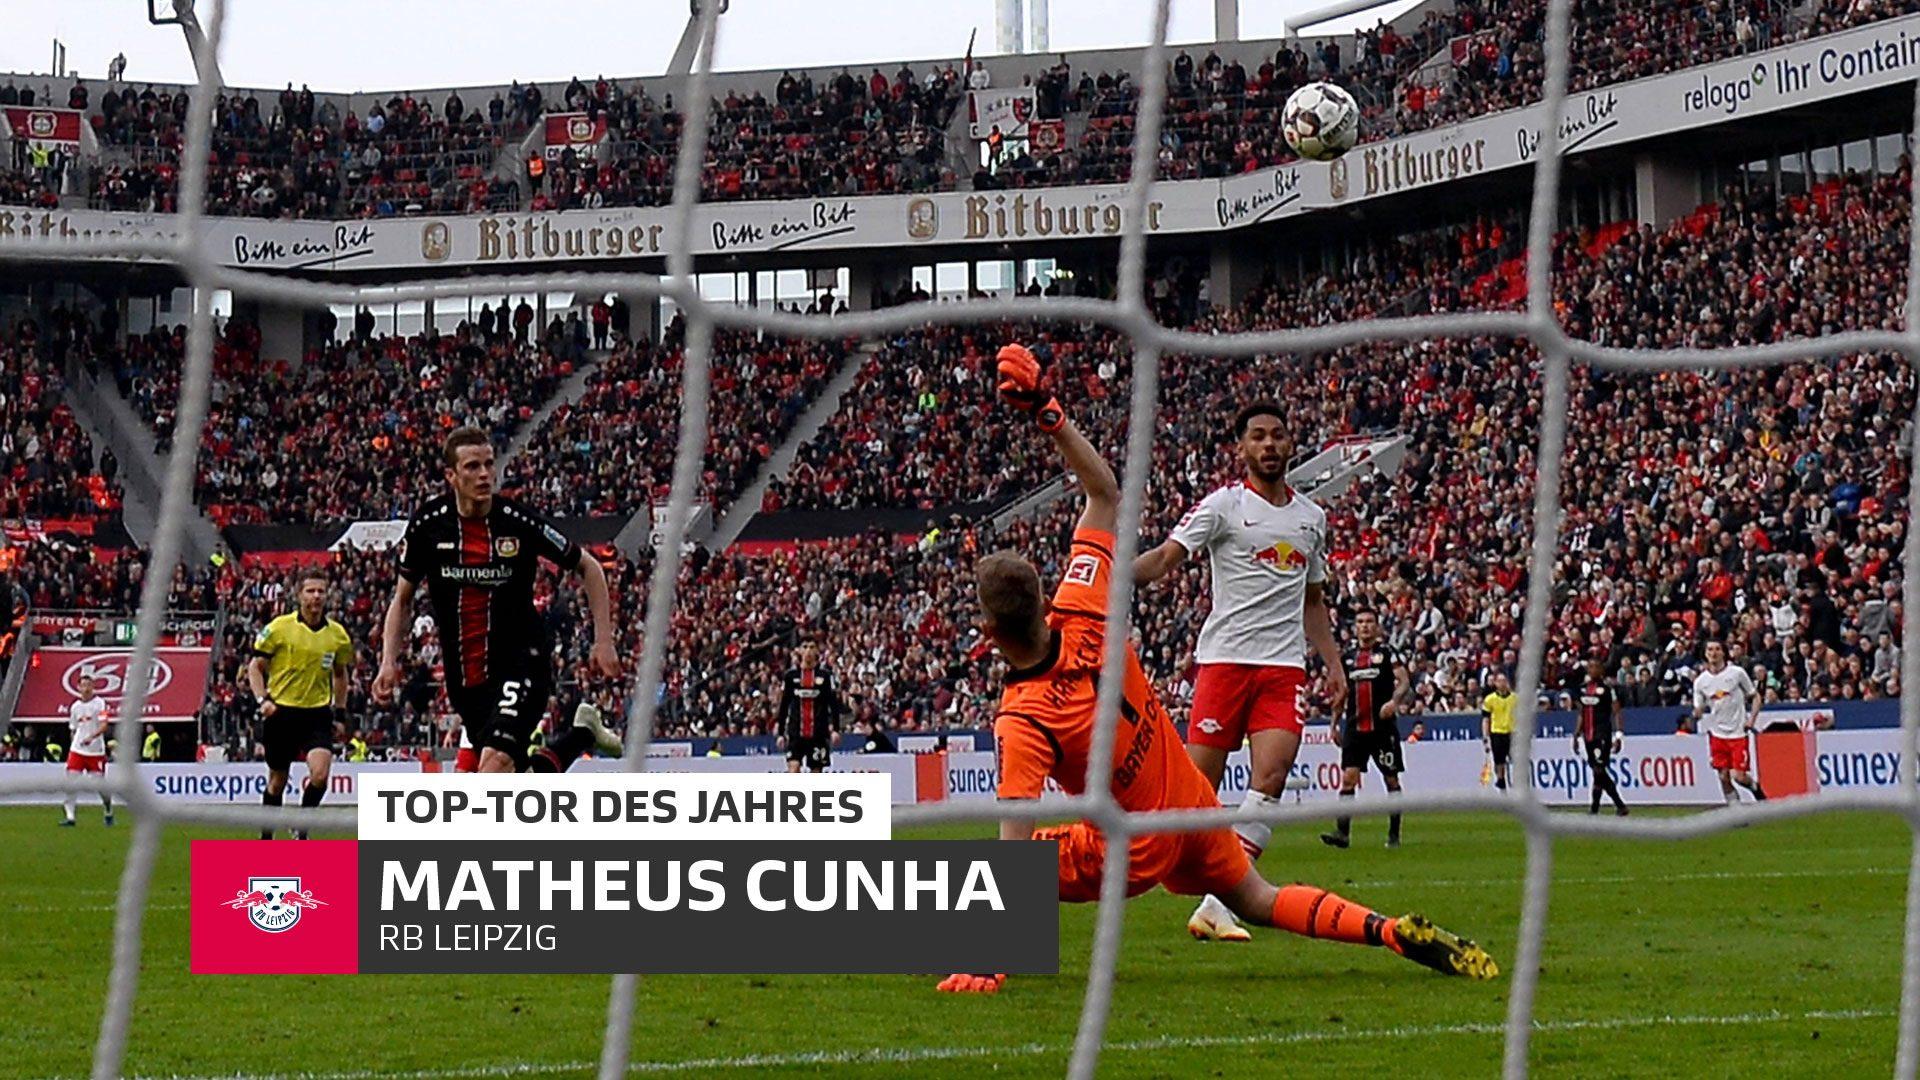 Matheus Cunha erzielt das Top-Tor des Jahres 2019